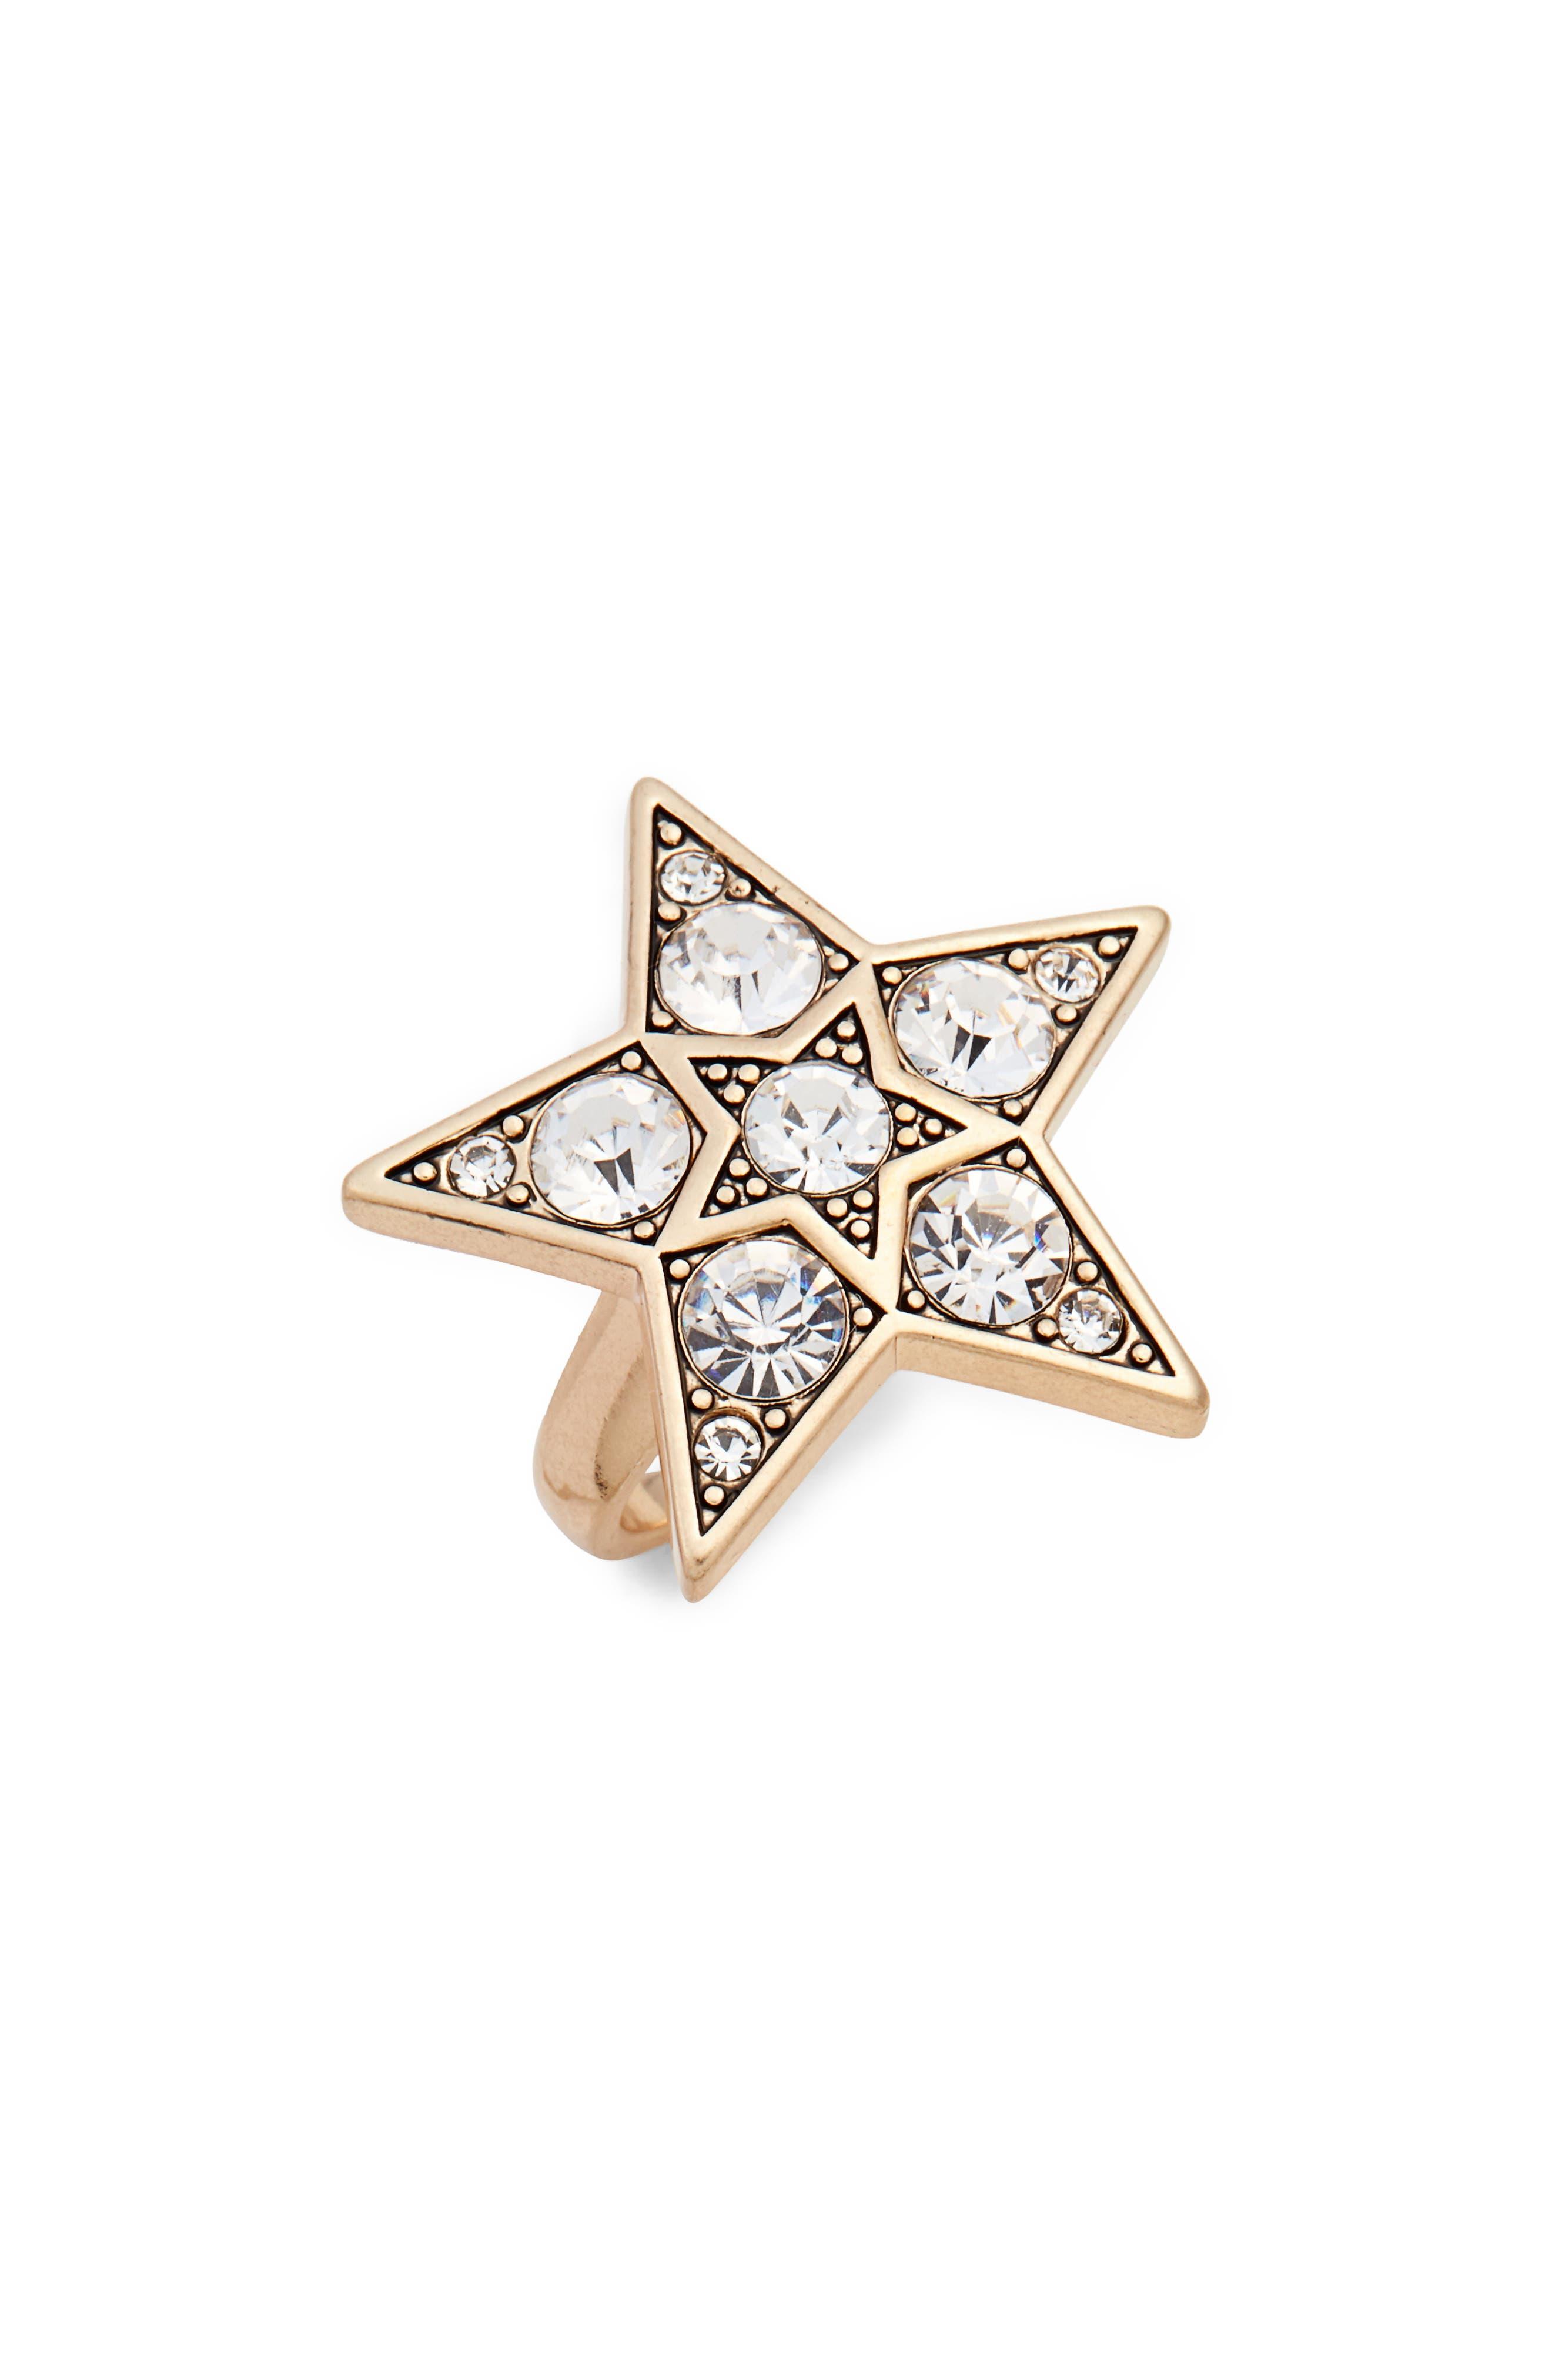 Main Image - Jenny Packham Star Ring